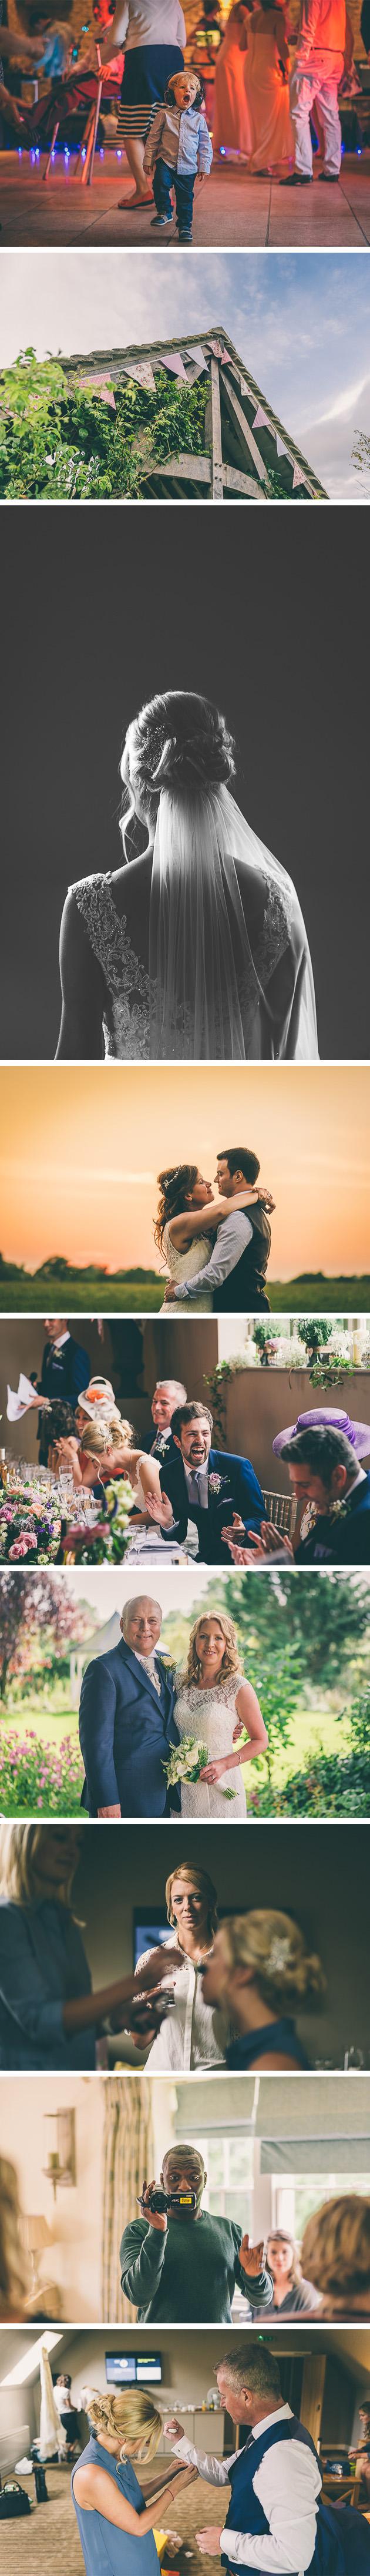 UK Wedding Photography 2016